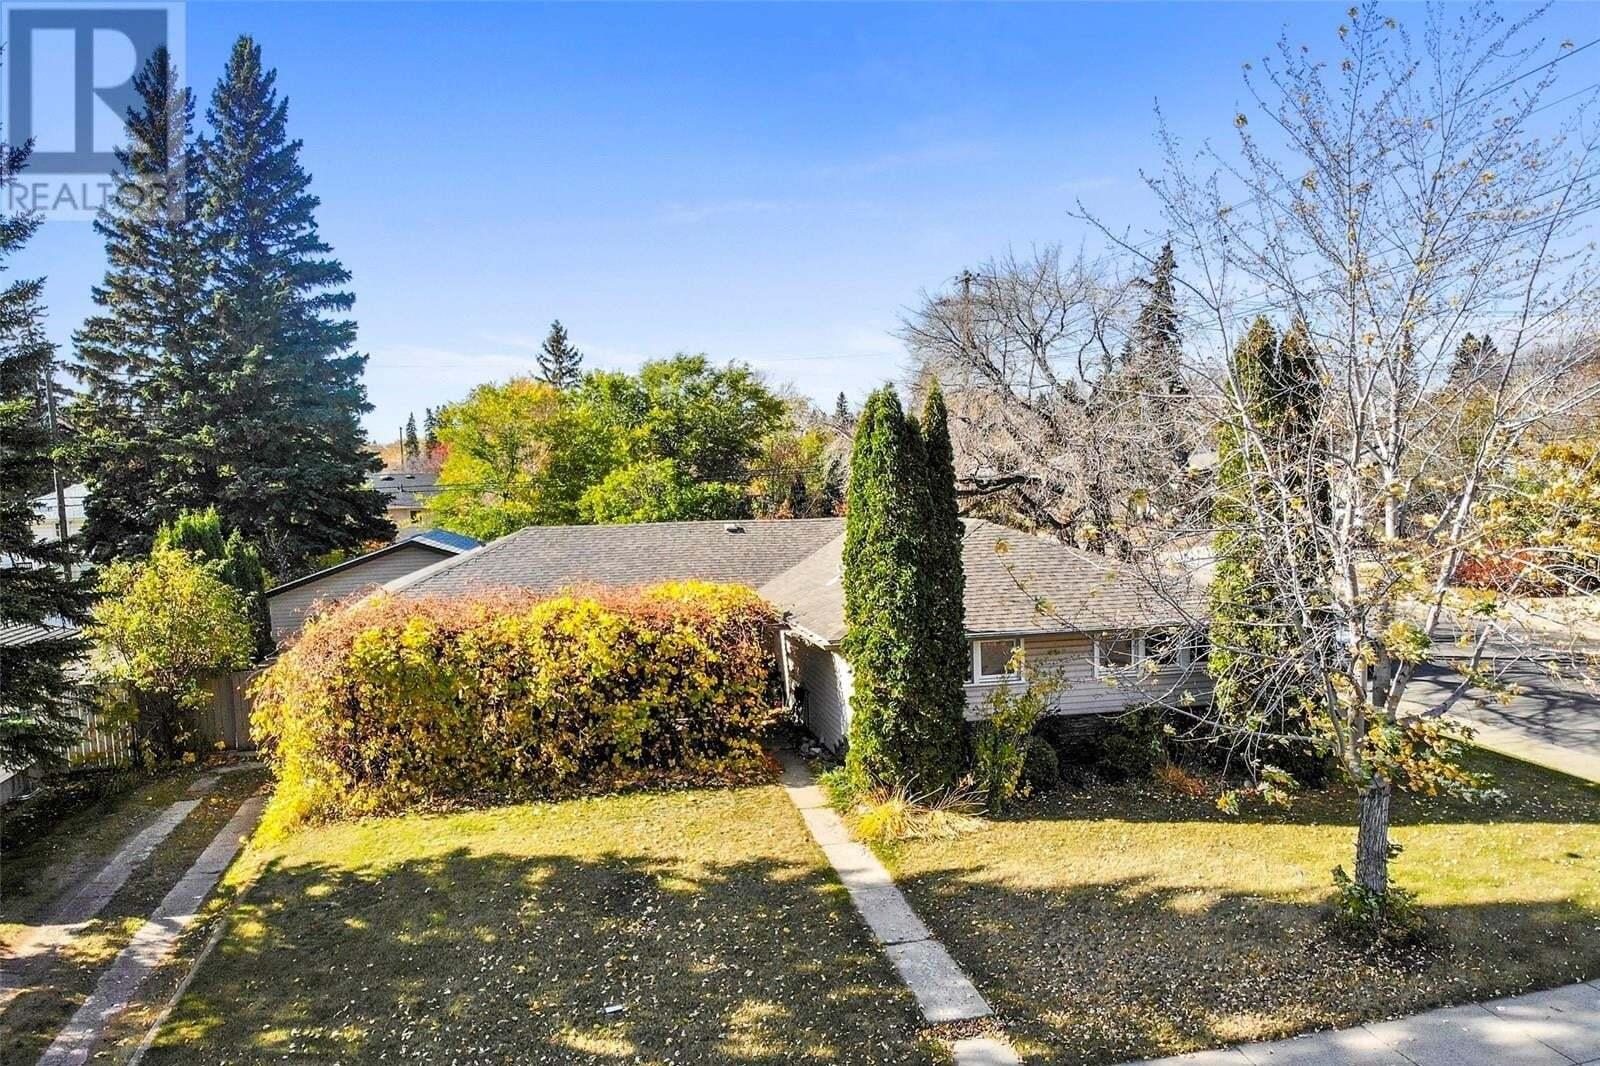 House for sale at 2502 William Ave Saskatoon Saskatchewan - MLS: SK828634